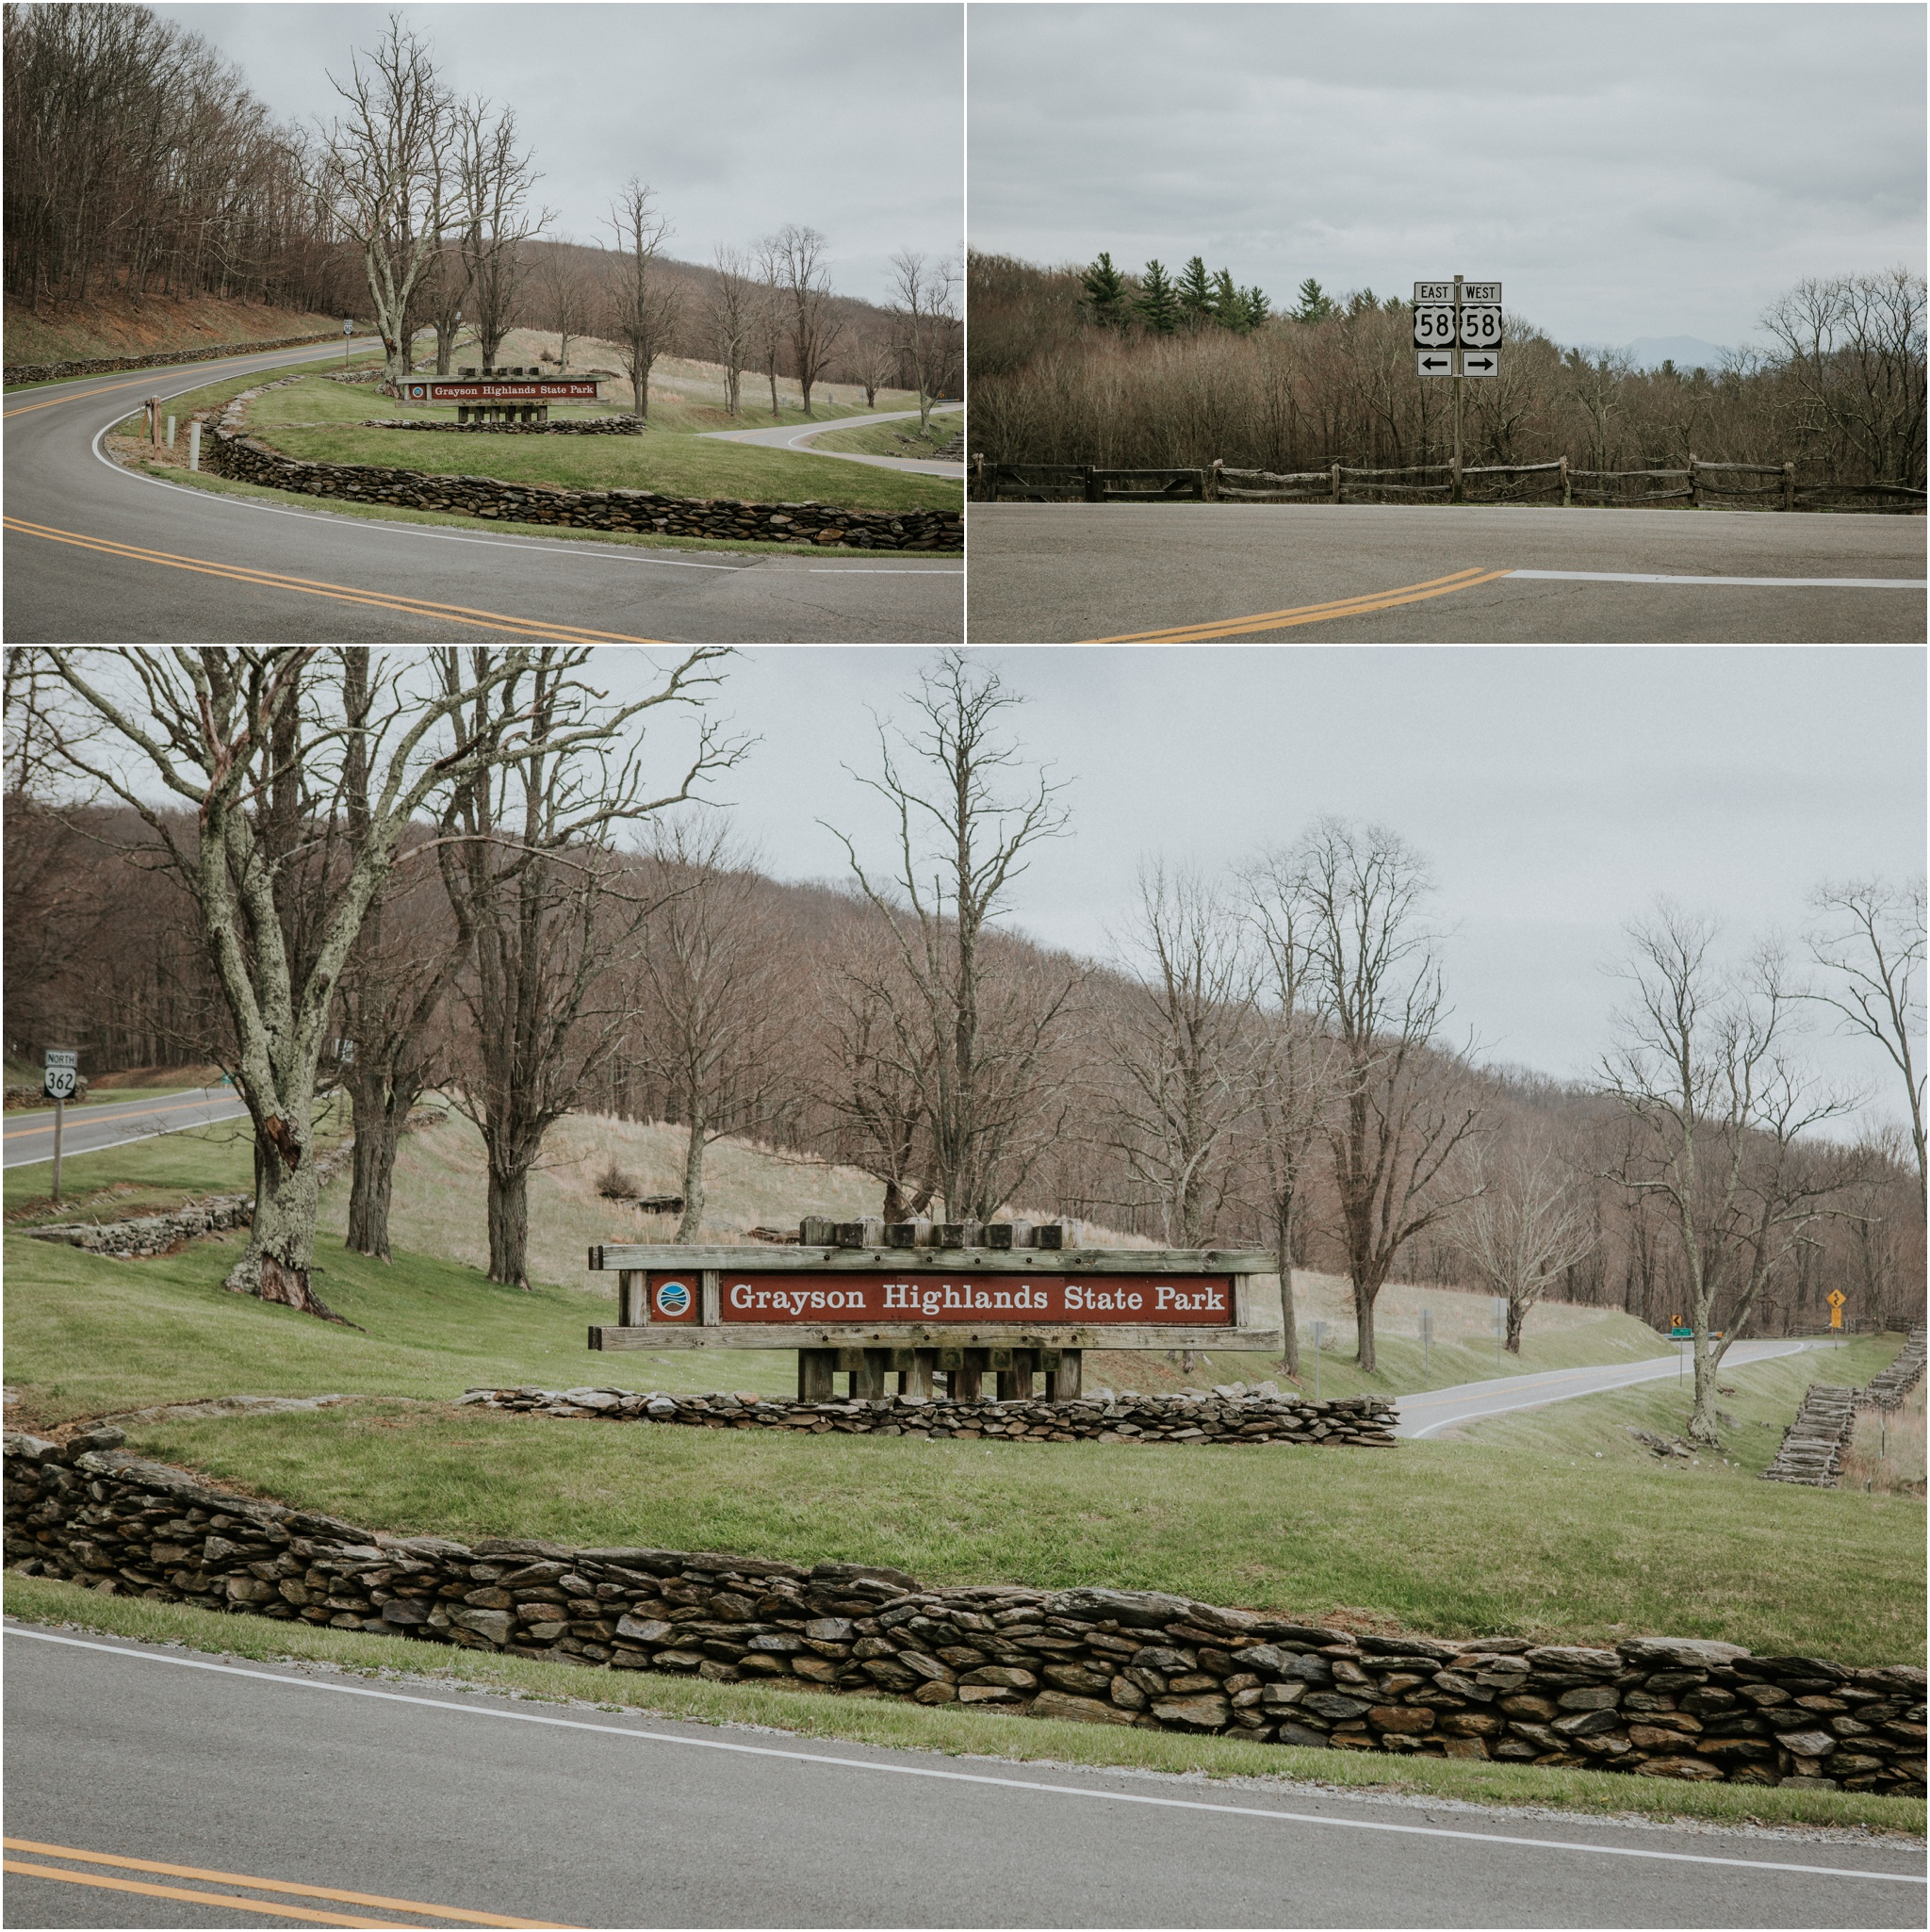 grayson-highlands-engagement-session-foggy-mountain-rustic-appalachian-virginia-katy-sergent-photography_0001.jpg